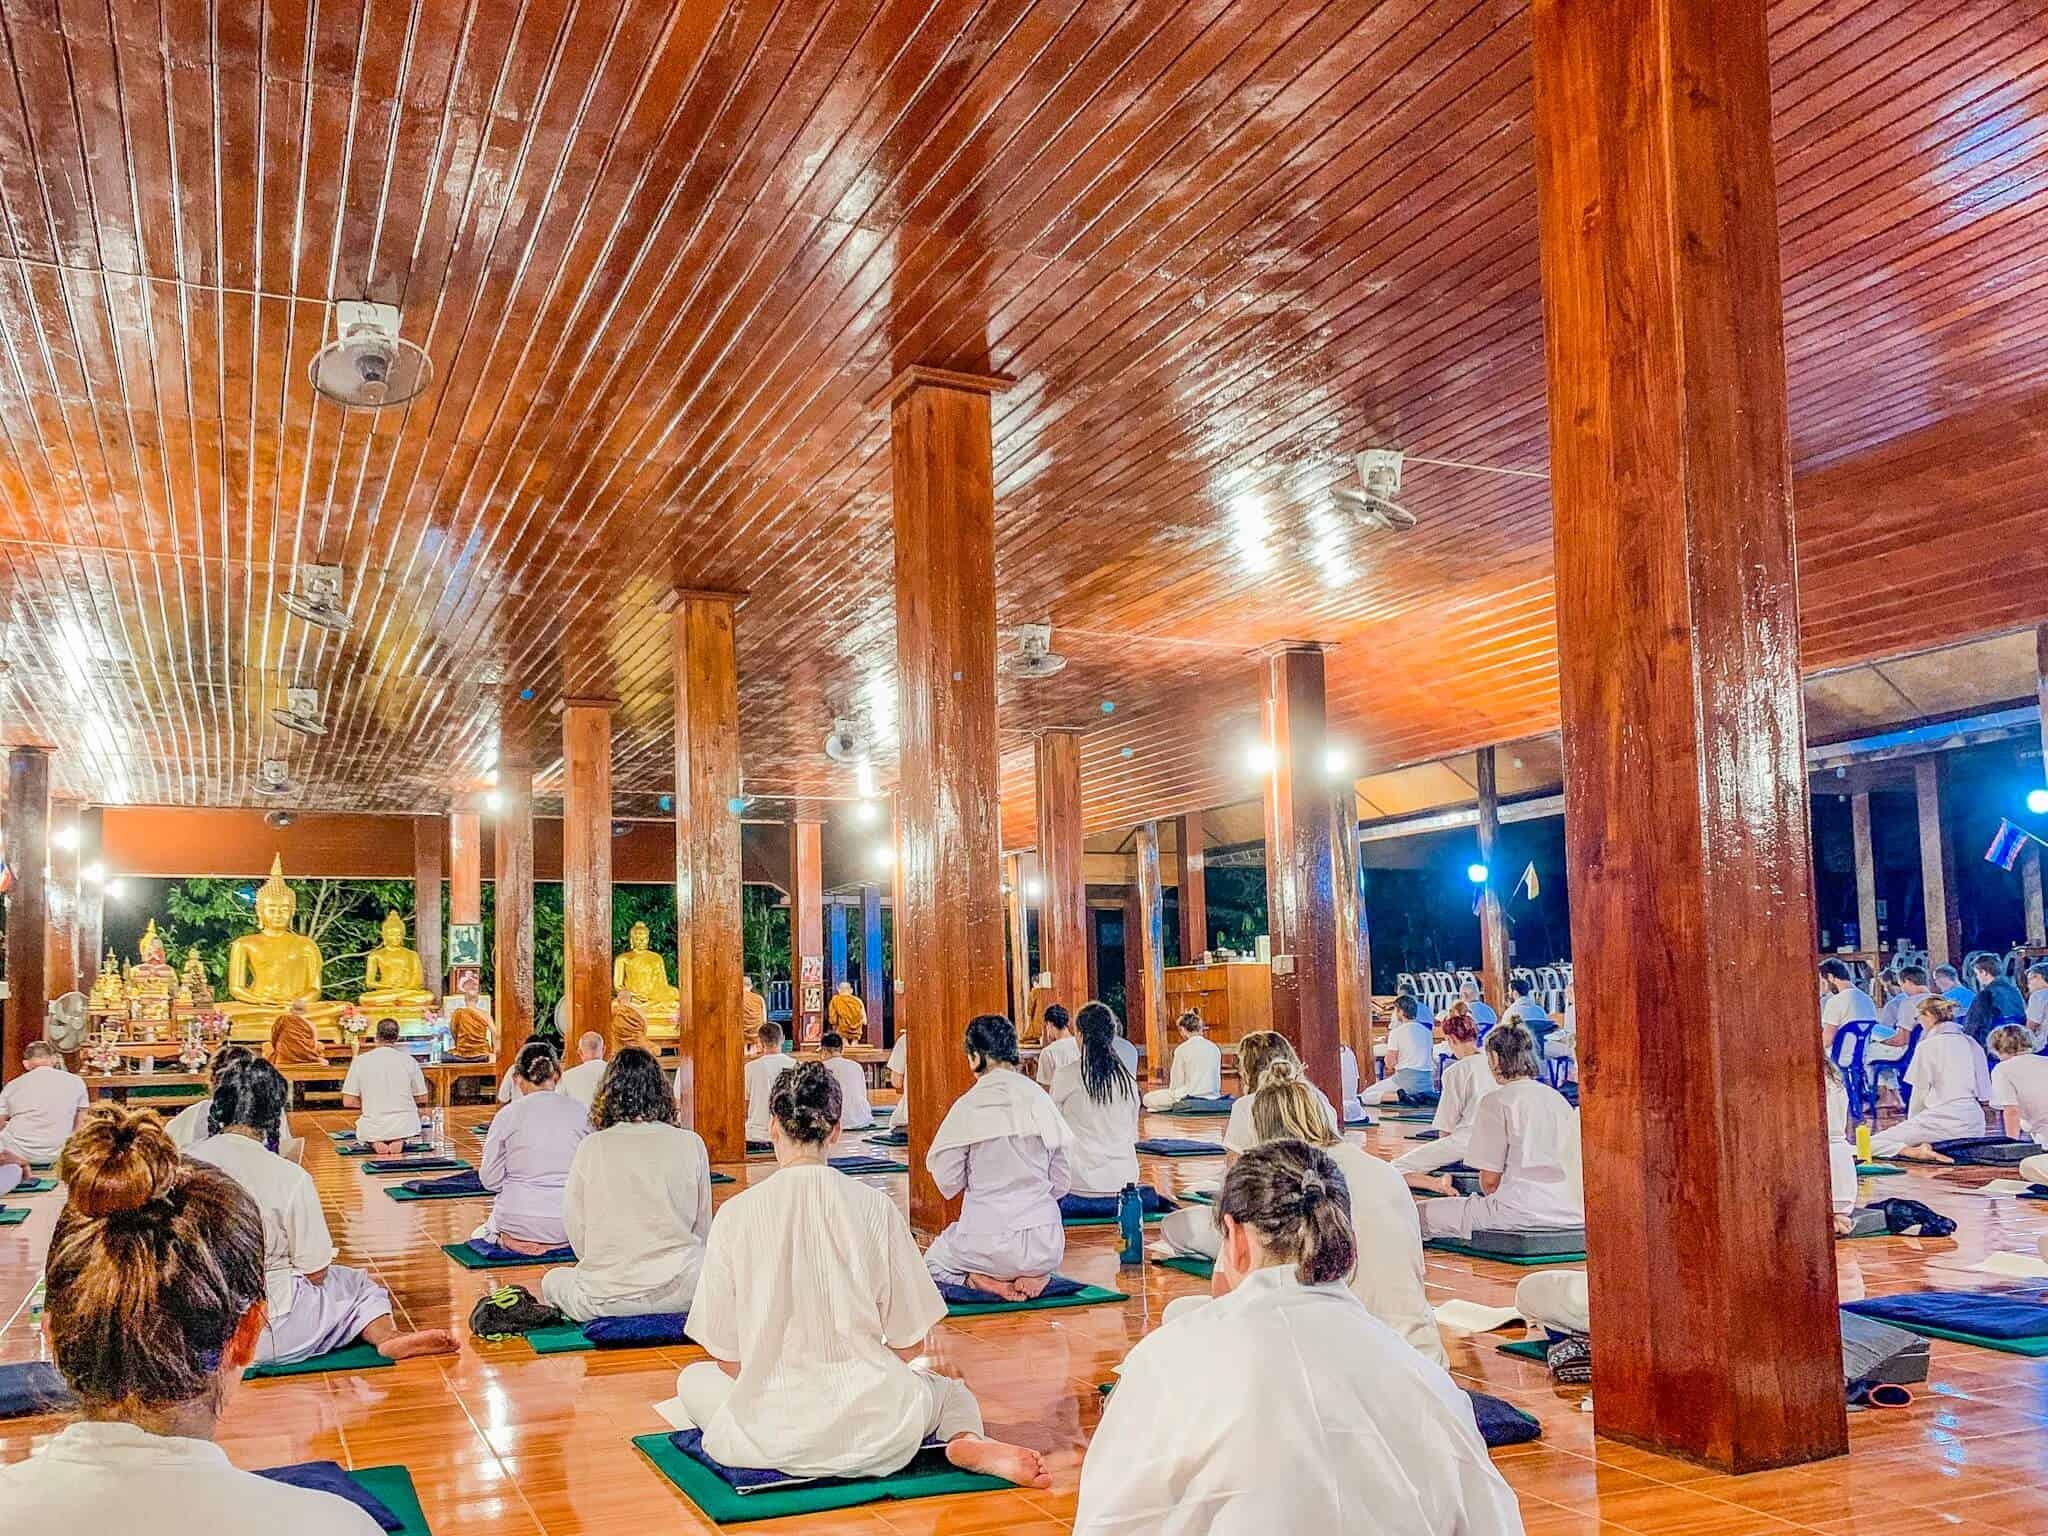 Sitting Meditation im Wat Pa Tam Wua Forest Monastery